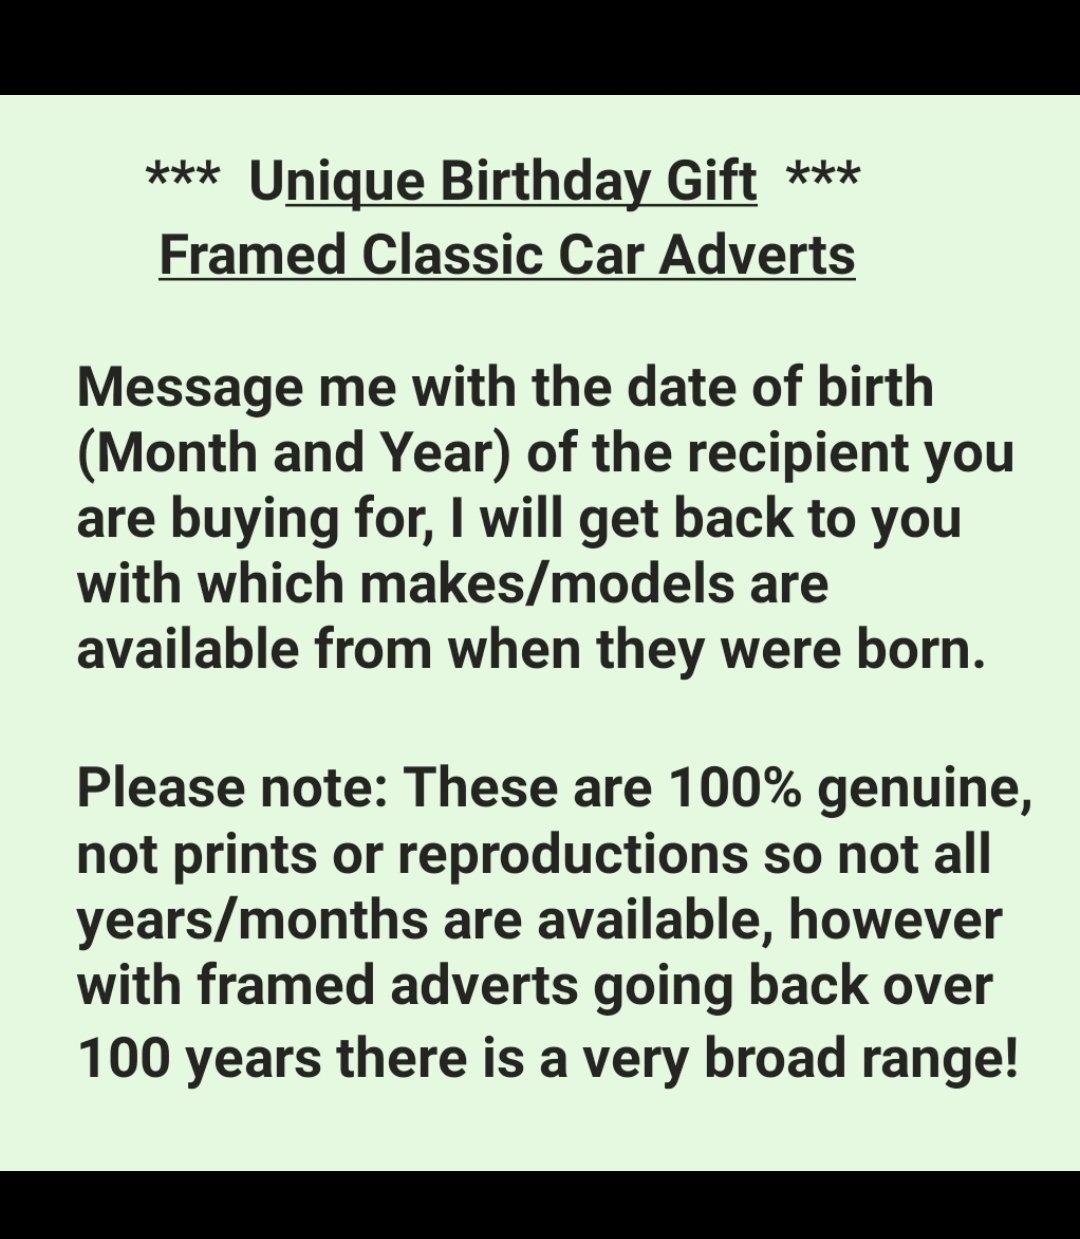 1968 Original 1940 Bentley Mark 5 Framed Advert  For Sale (picture 3 of 3)